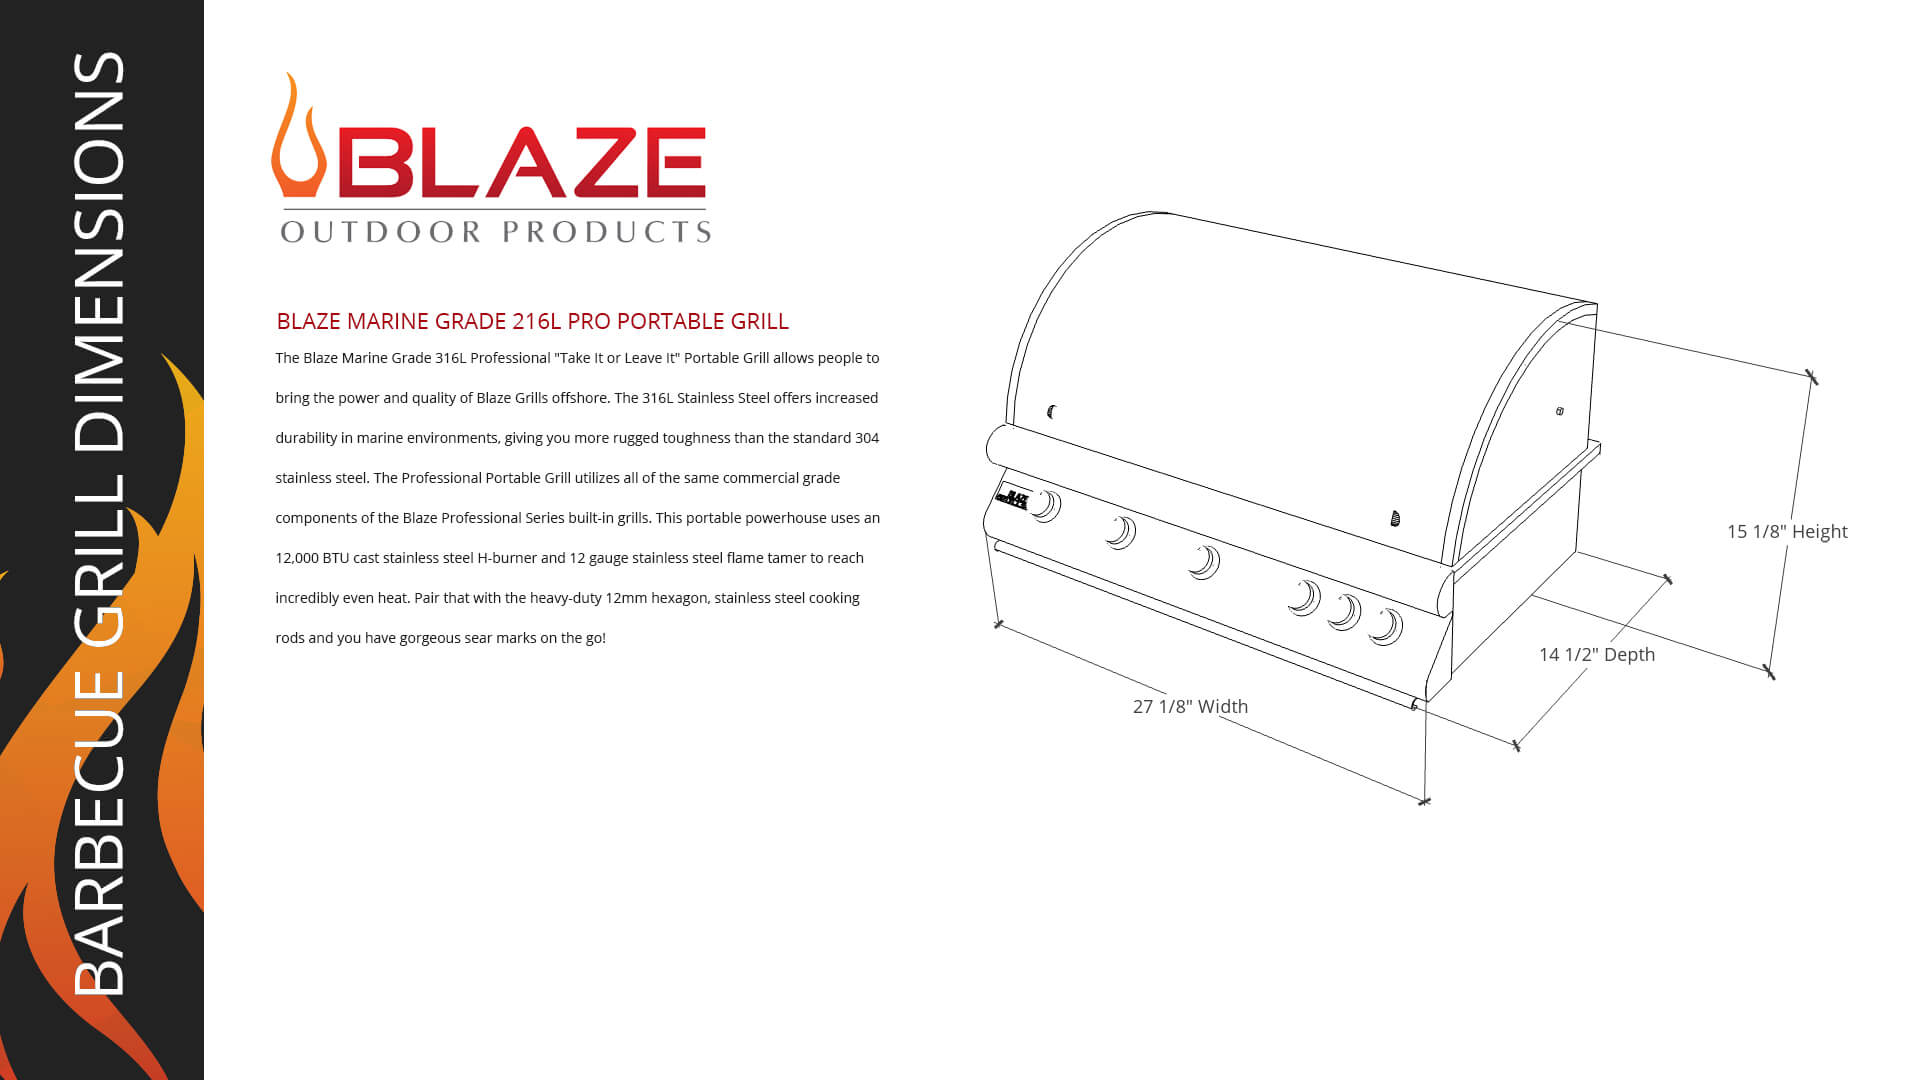 Blaze Marine Grade 316L Professional - Take It or Leave It - Portable Grill